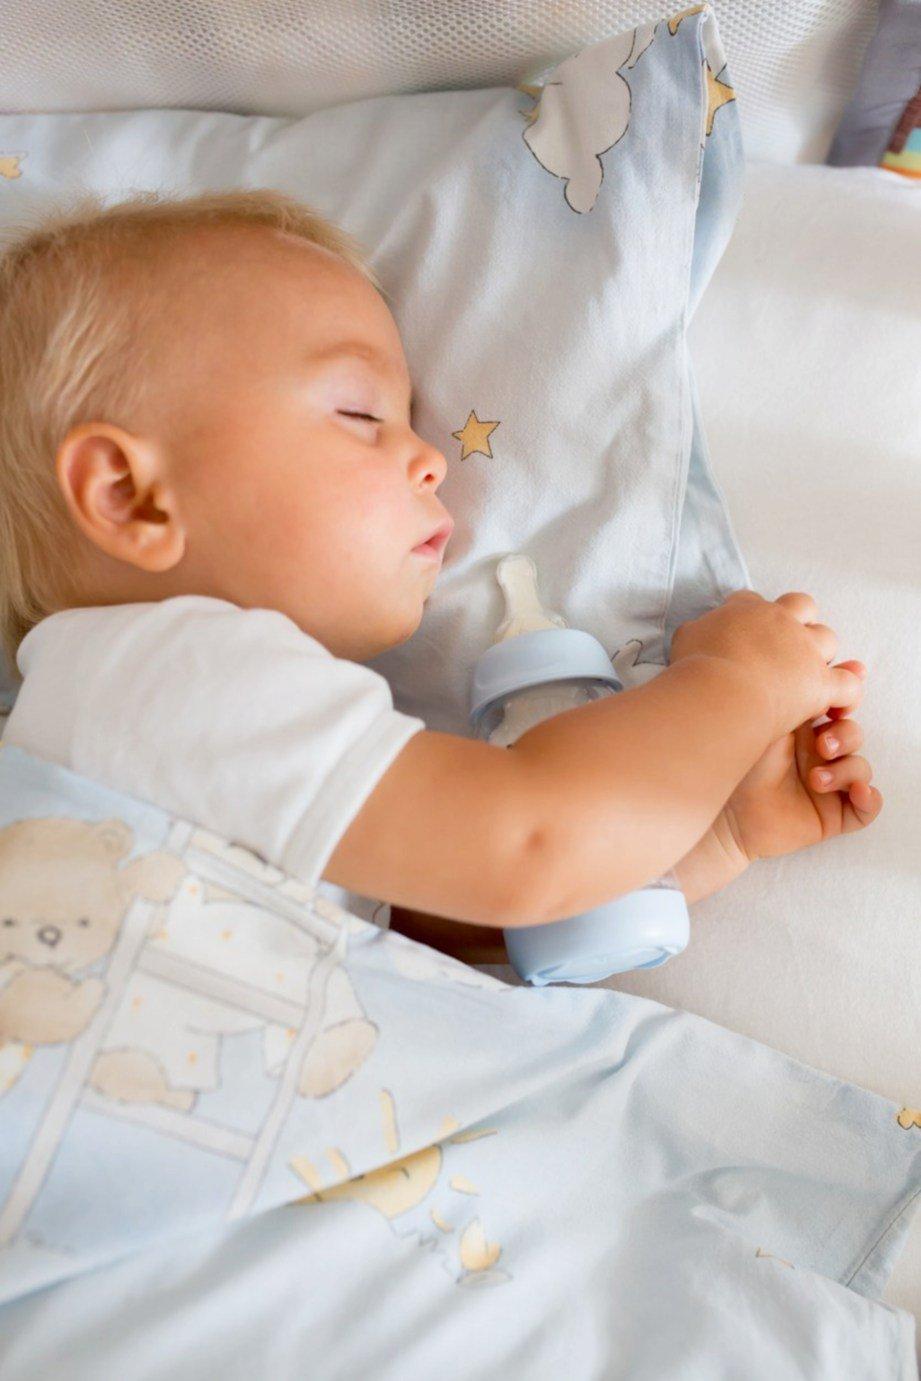 KETIKA kanak-kanak tidur proses penelanan terhenti dan akibatkan susu bertakung di permukaan gigi. FOTO: Sumber Google